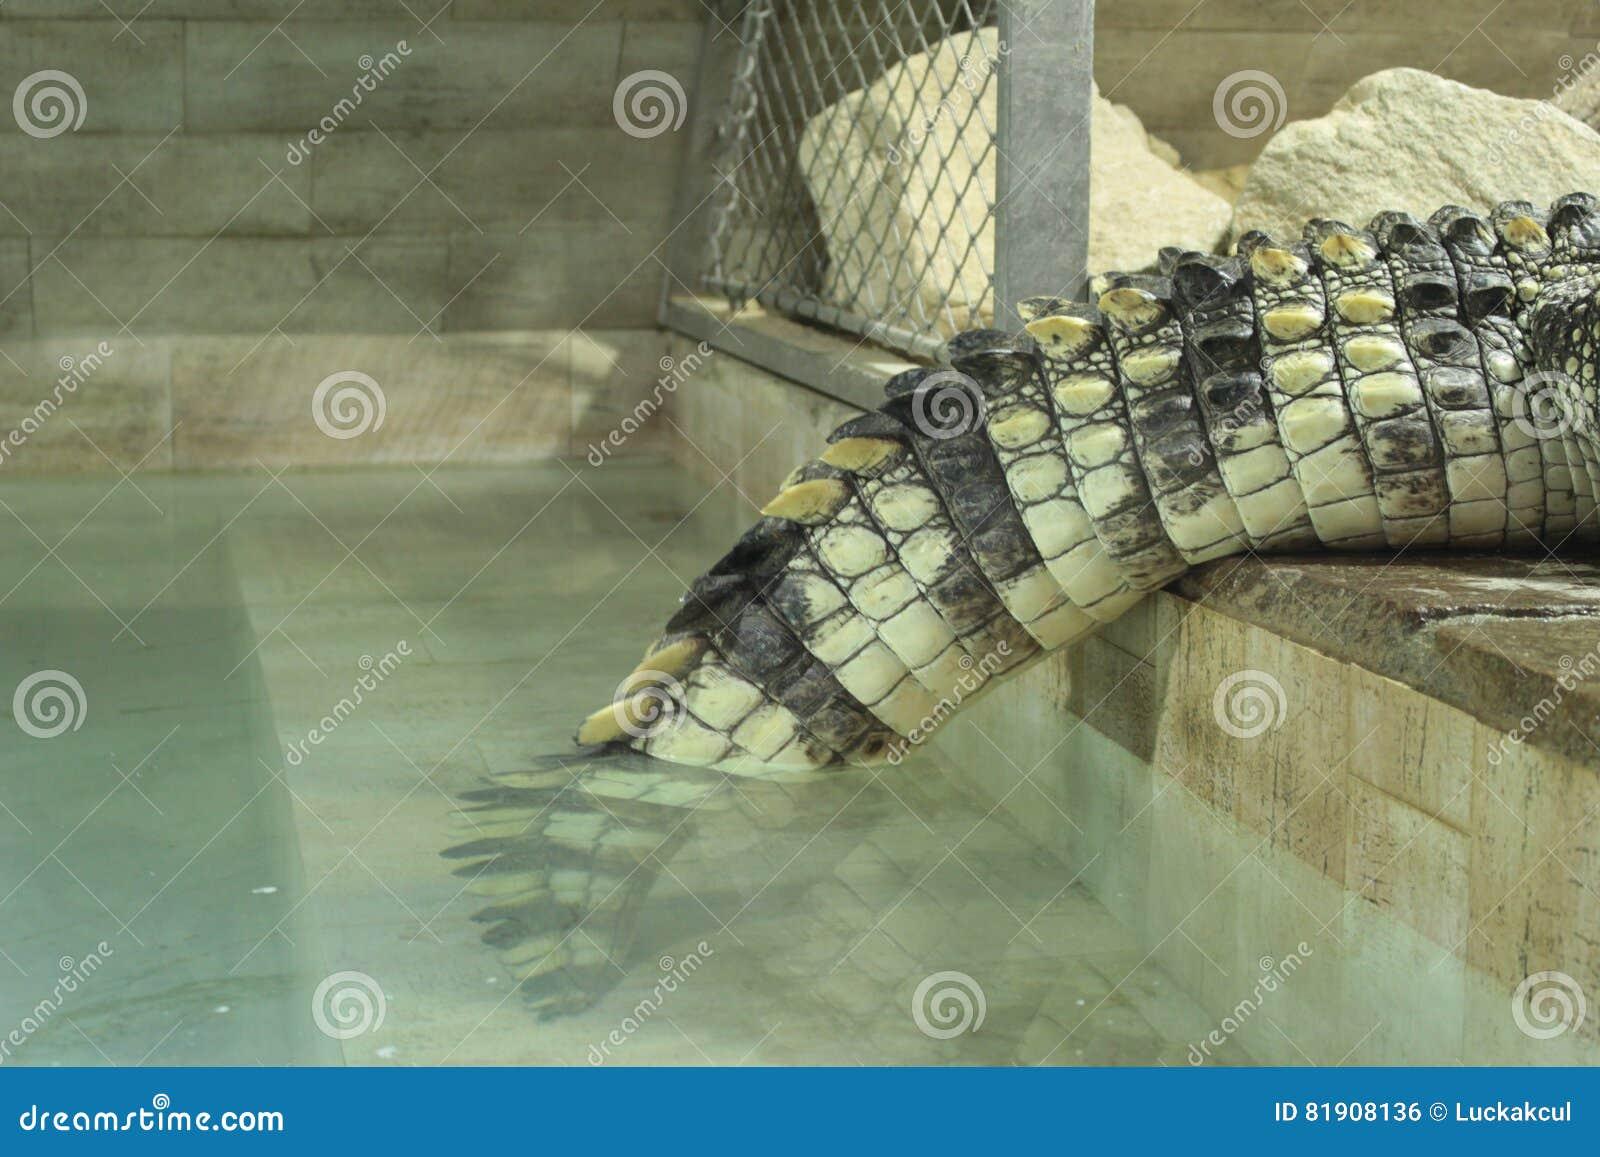 Saltwater Crocodile Tail Stock Photo Image Of Crocodile 81908136